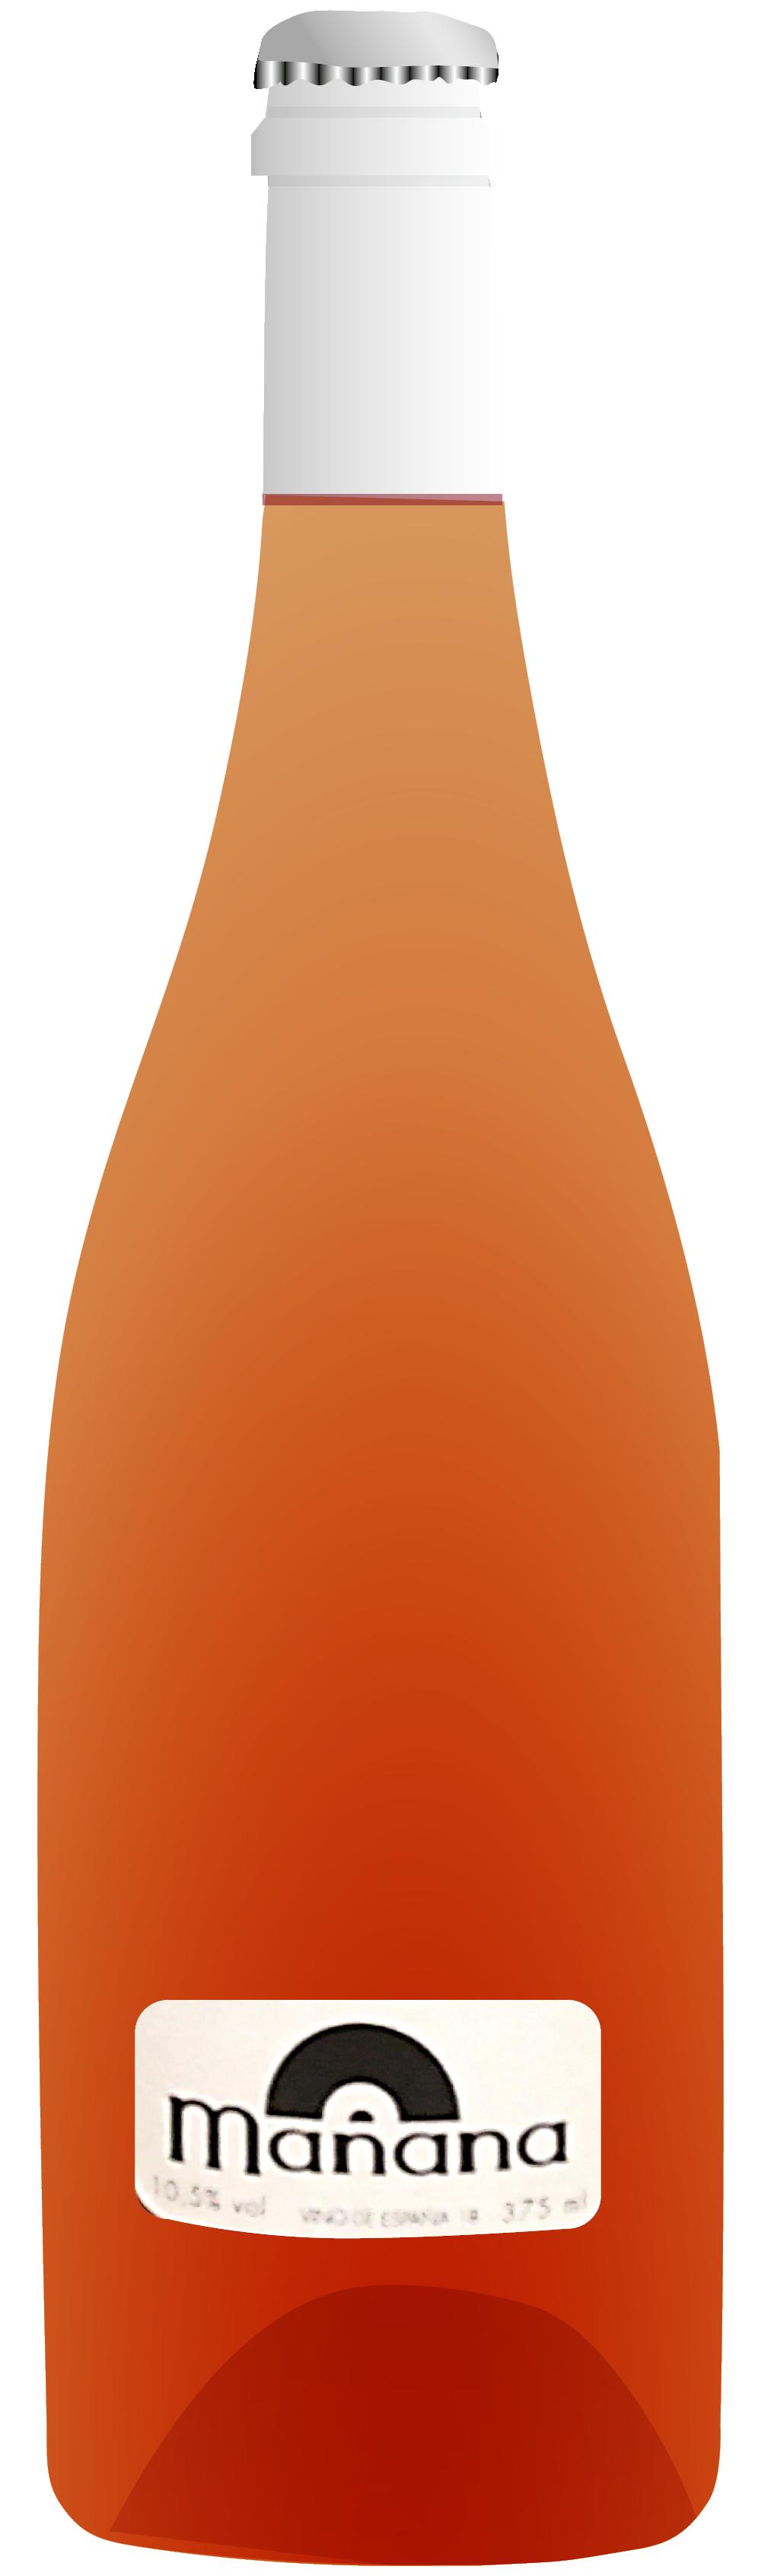 the natural wine company club august 2021 spain fernando angulo man%cc%83ana